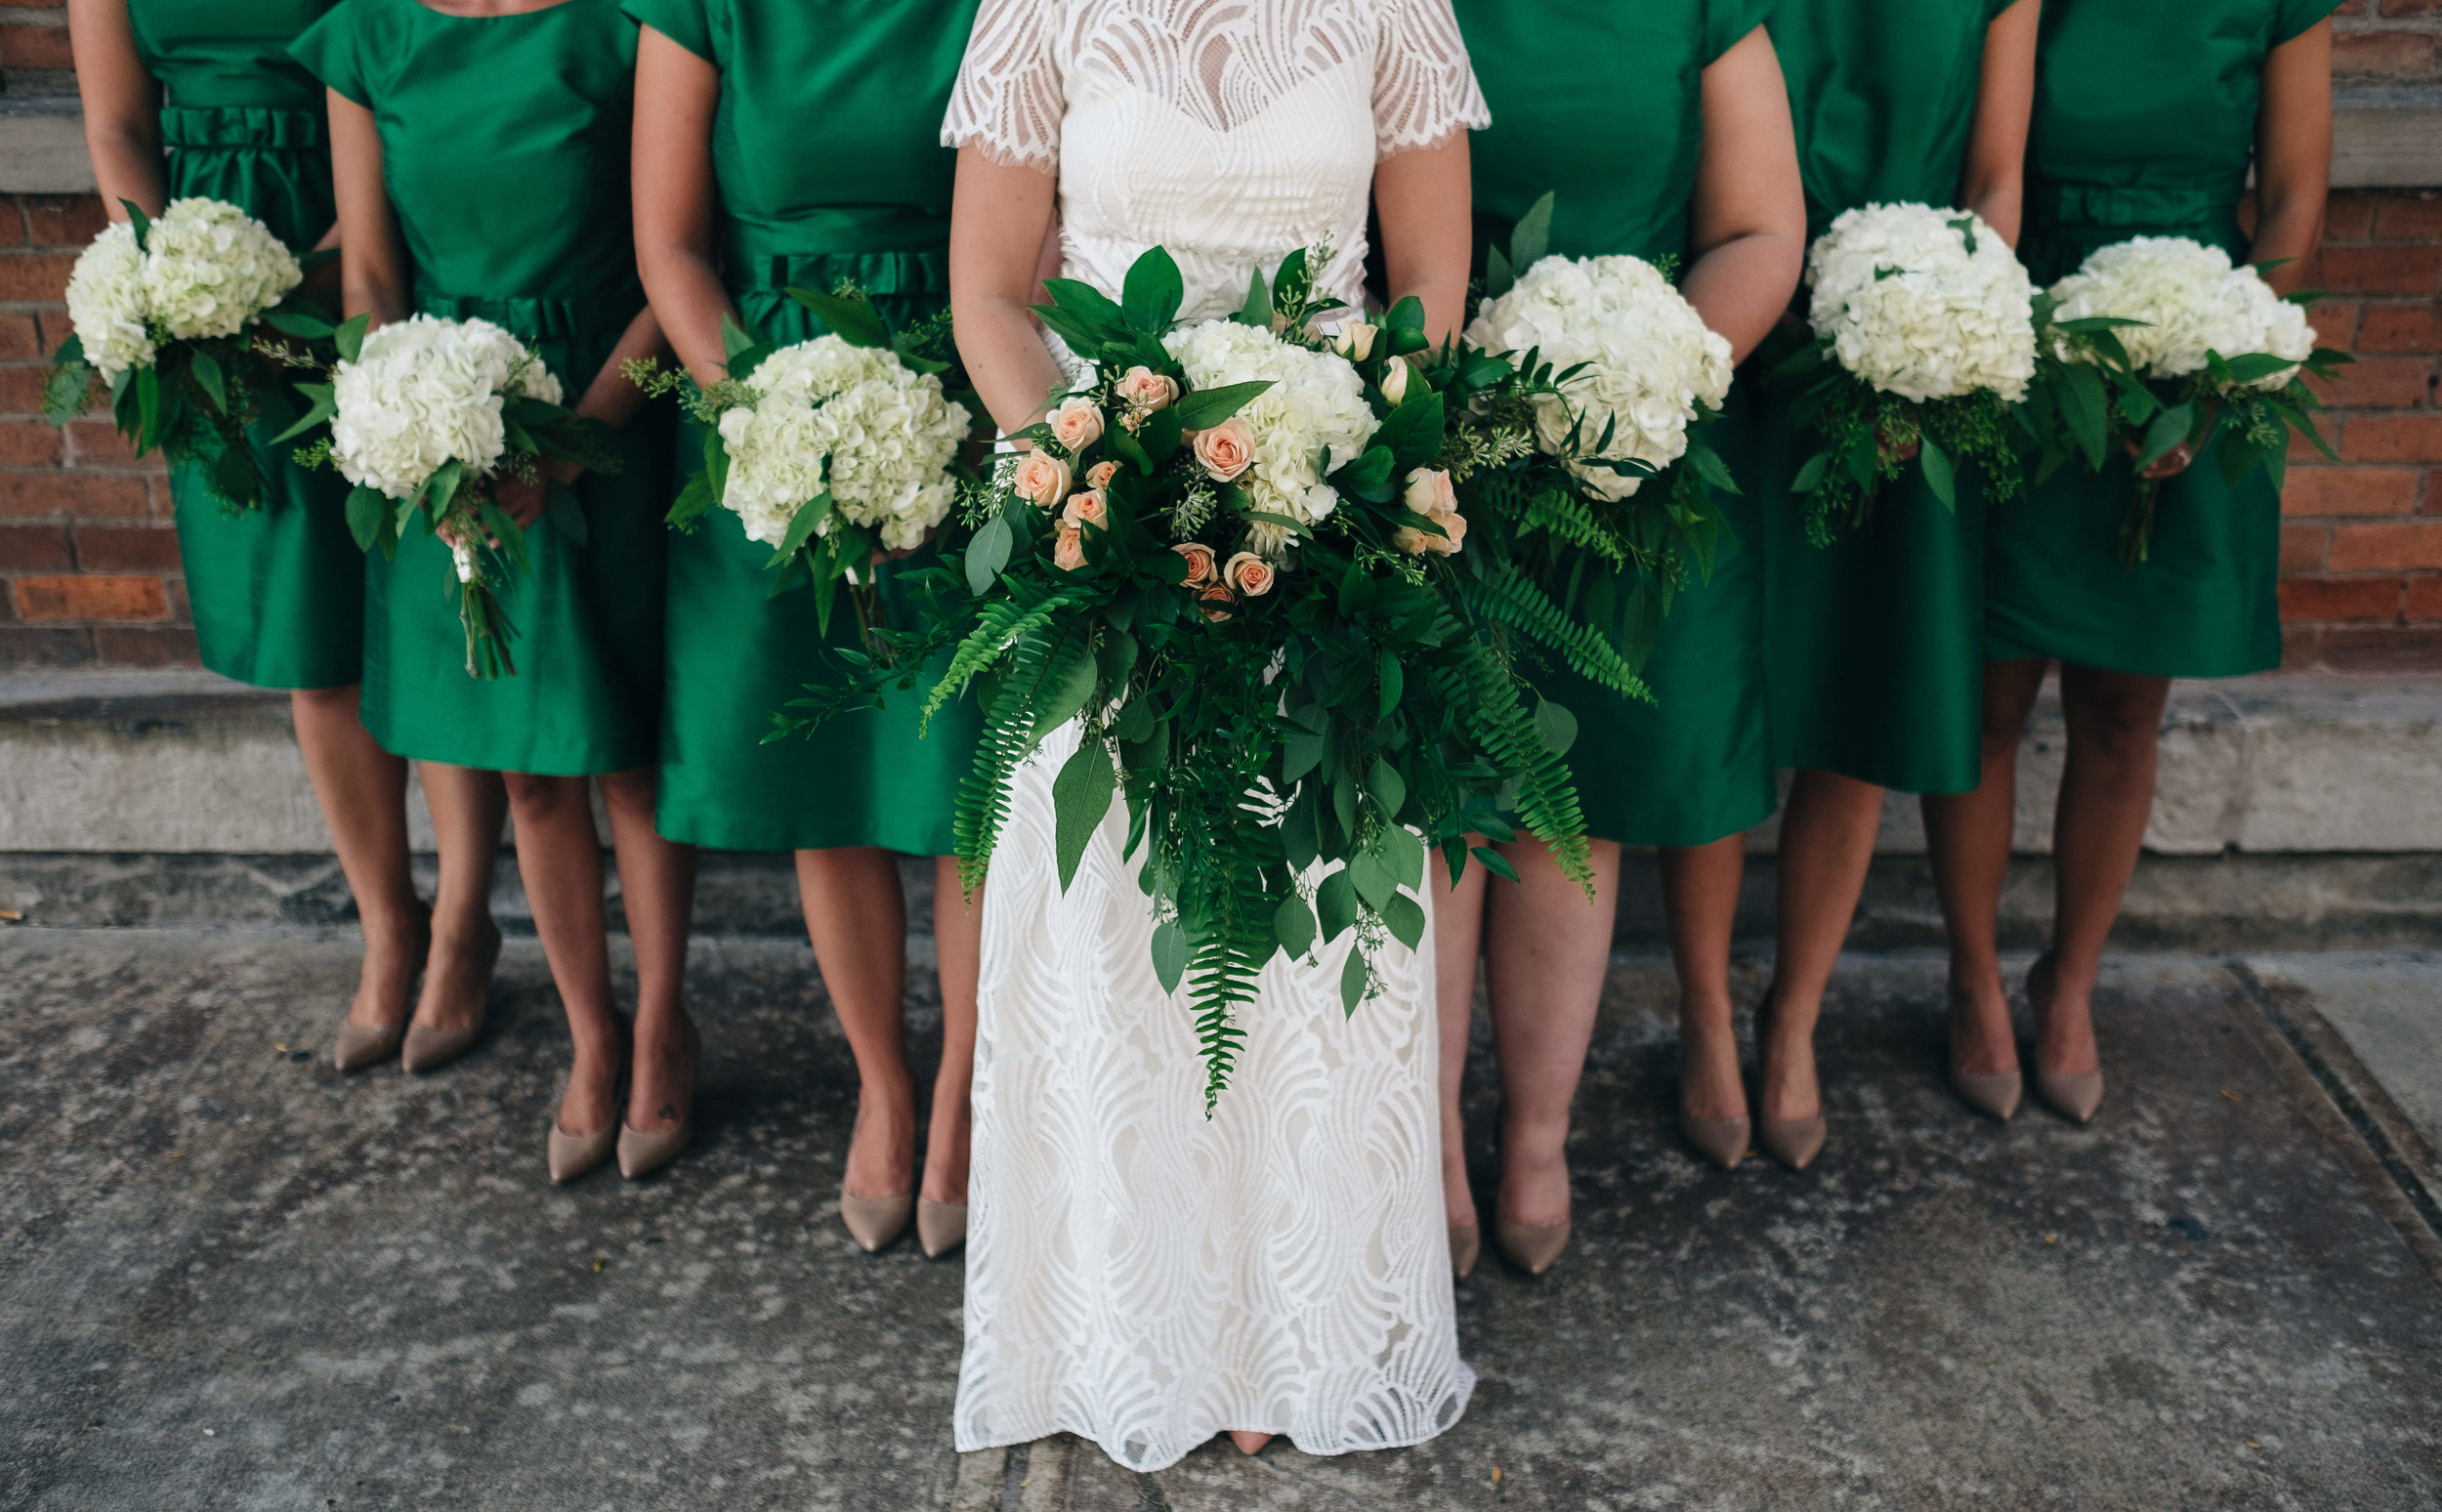 Bridesmaids floral arrangements in emerald green wedding.